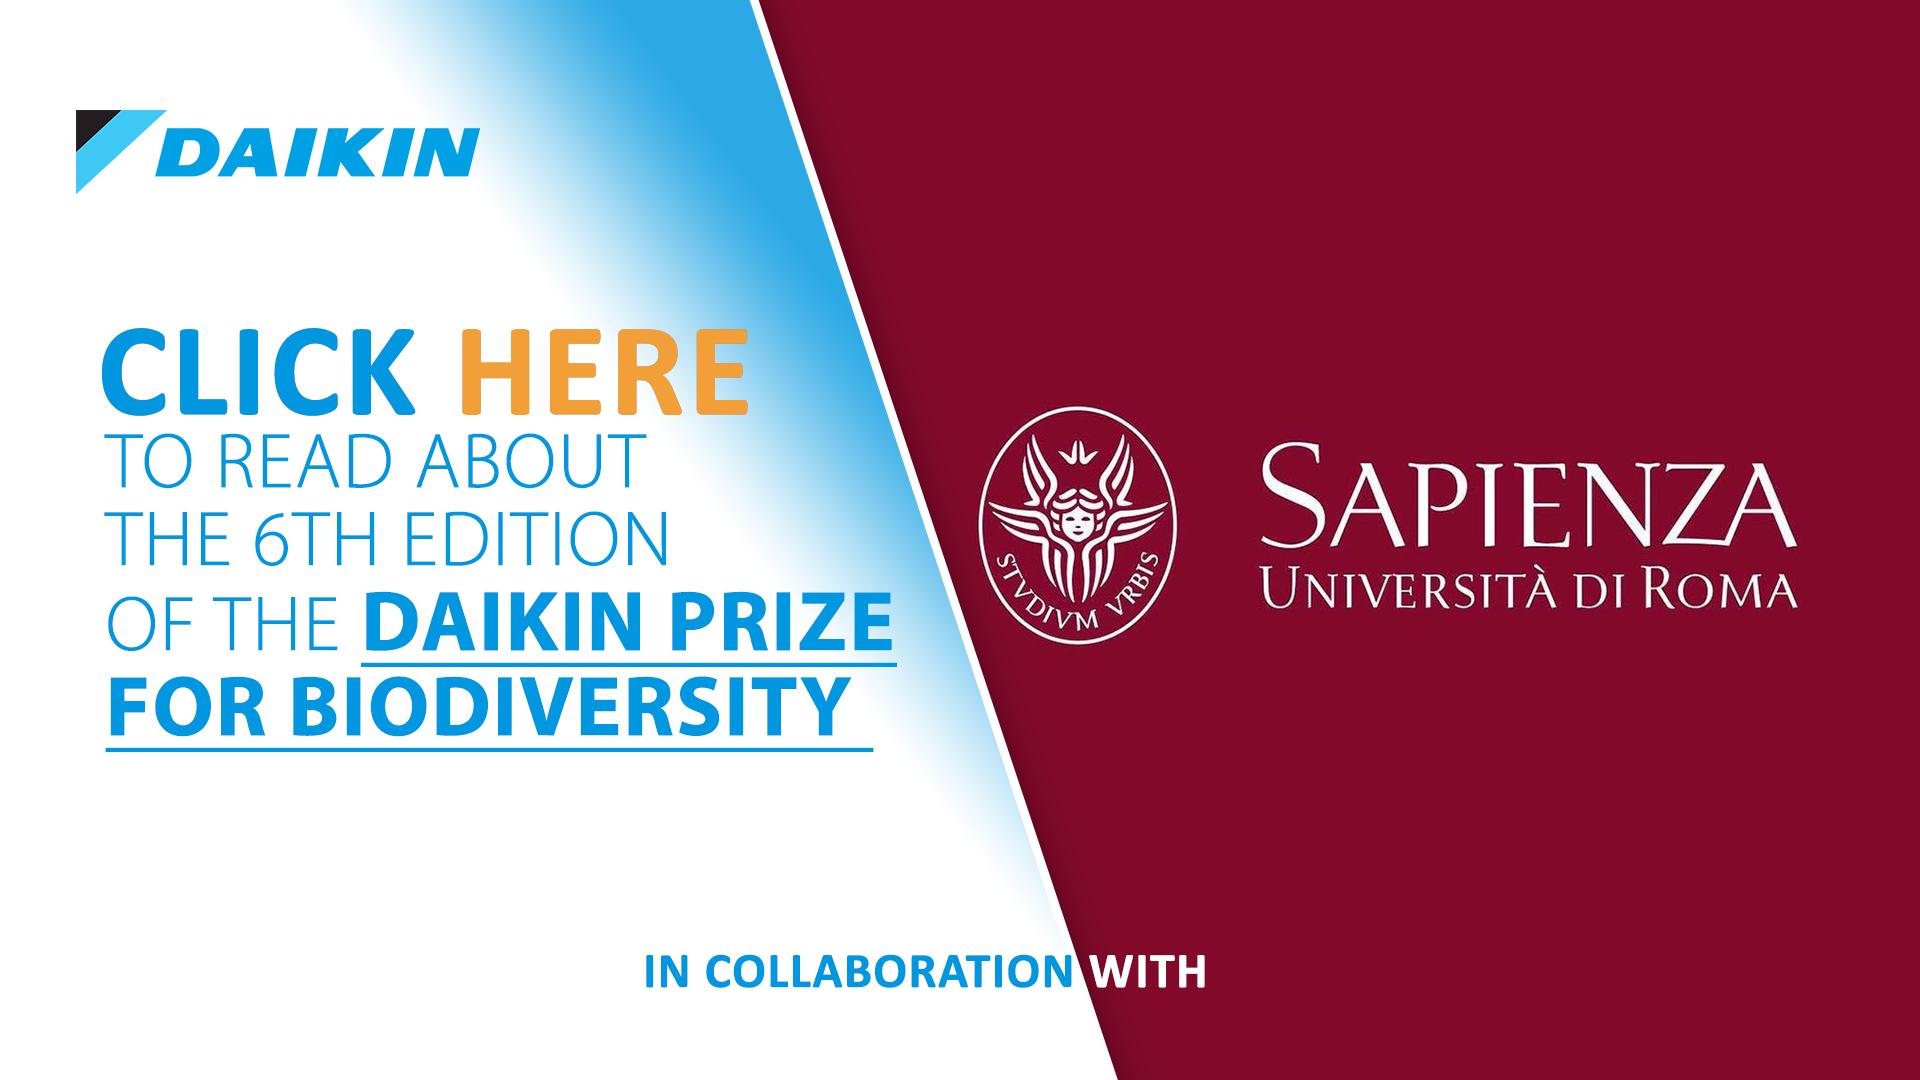 Daikin Prize for Biodiversity Conservation